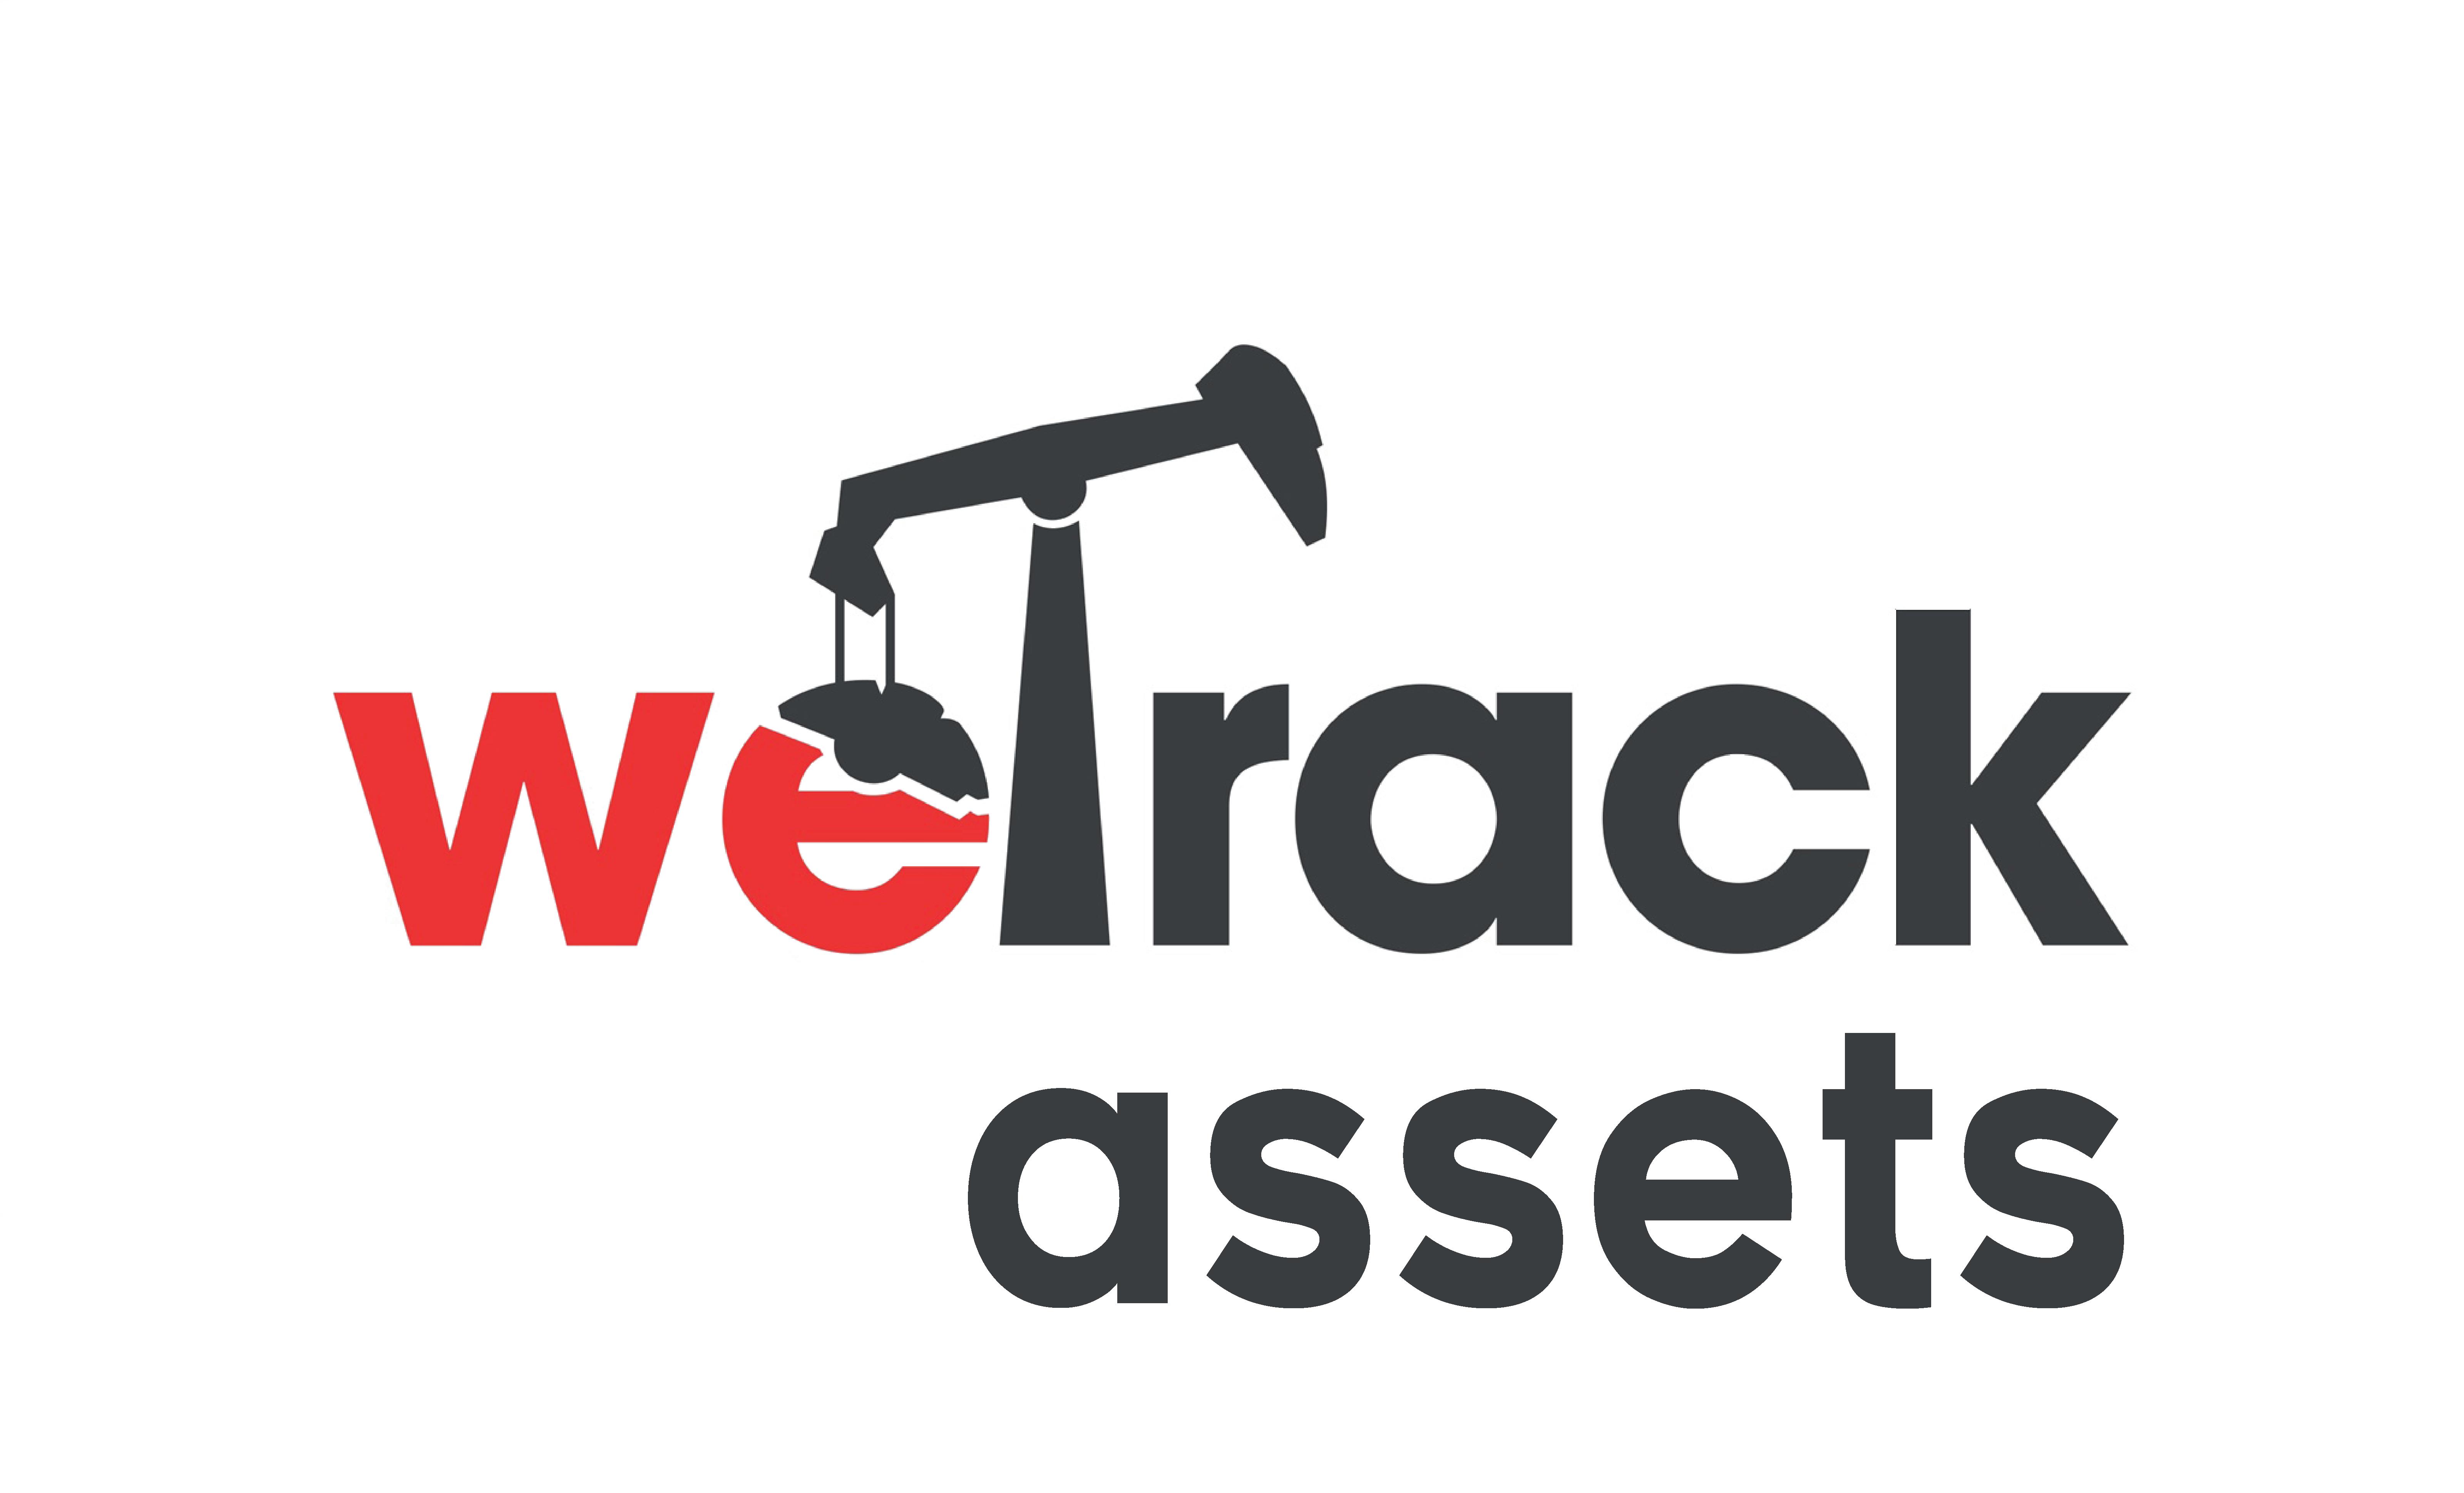 assets logo